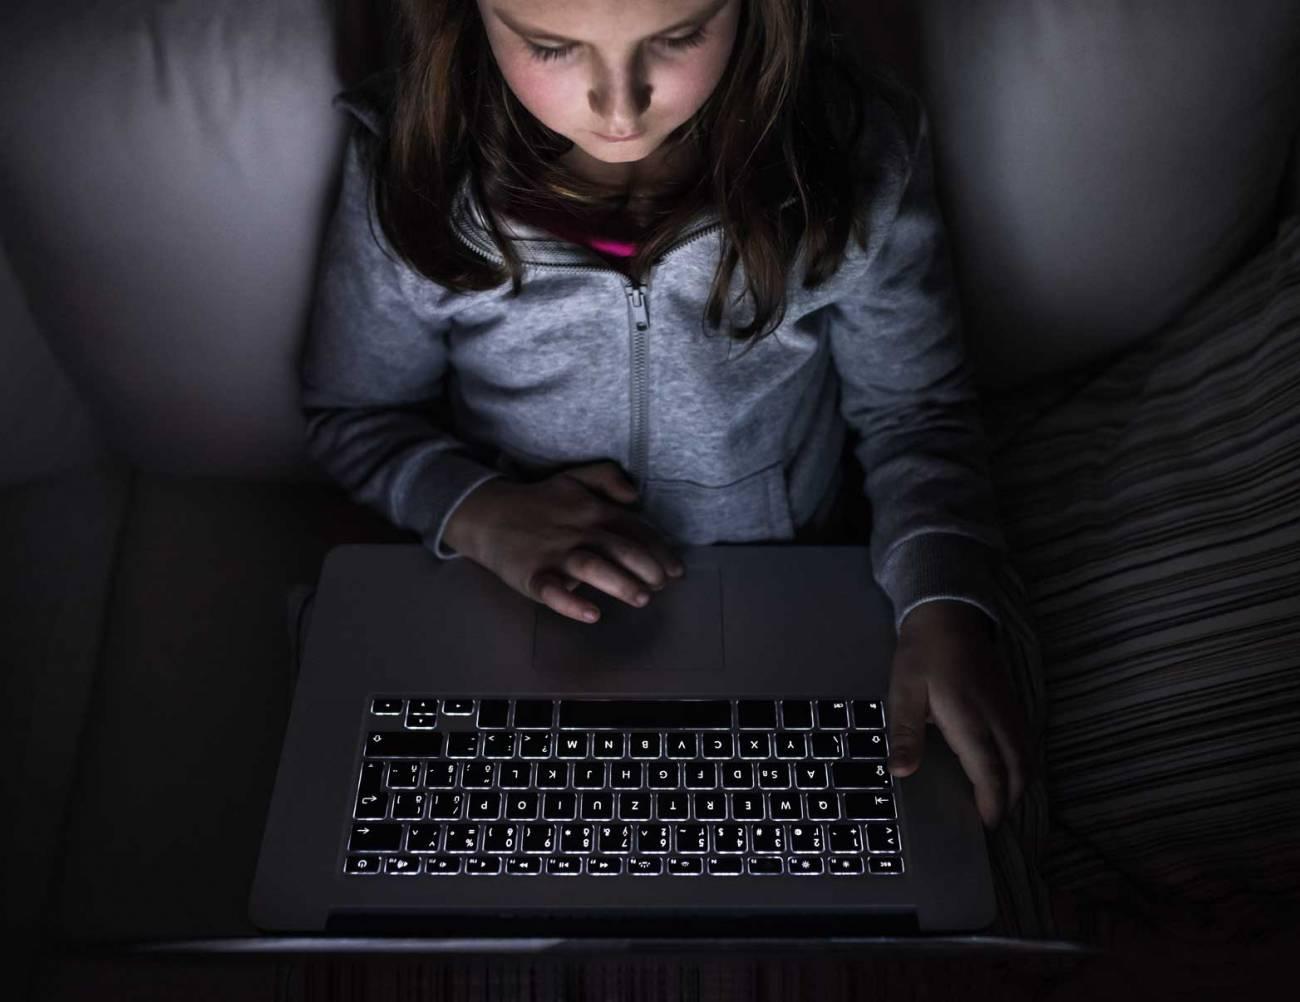 webs peligrosas ciberseguridad